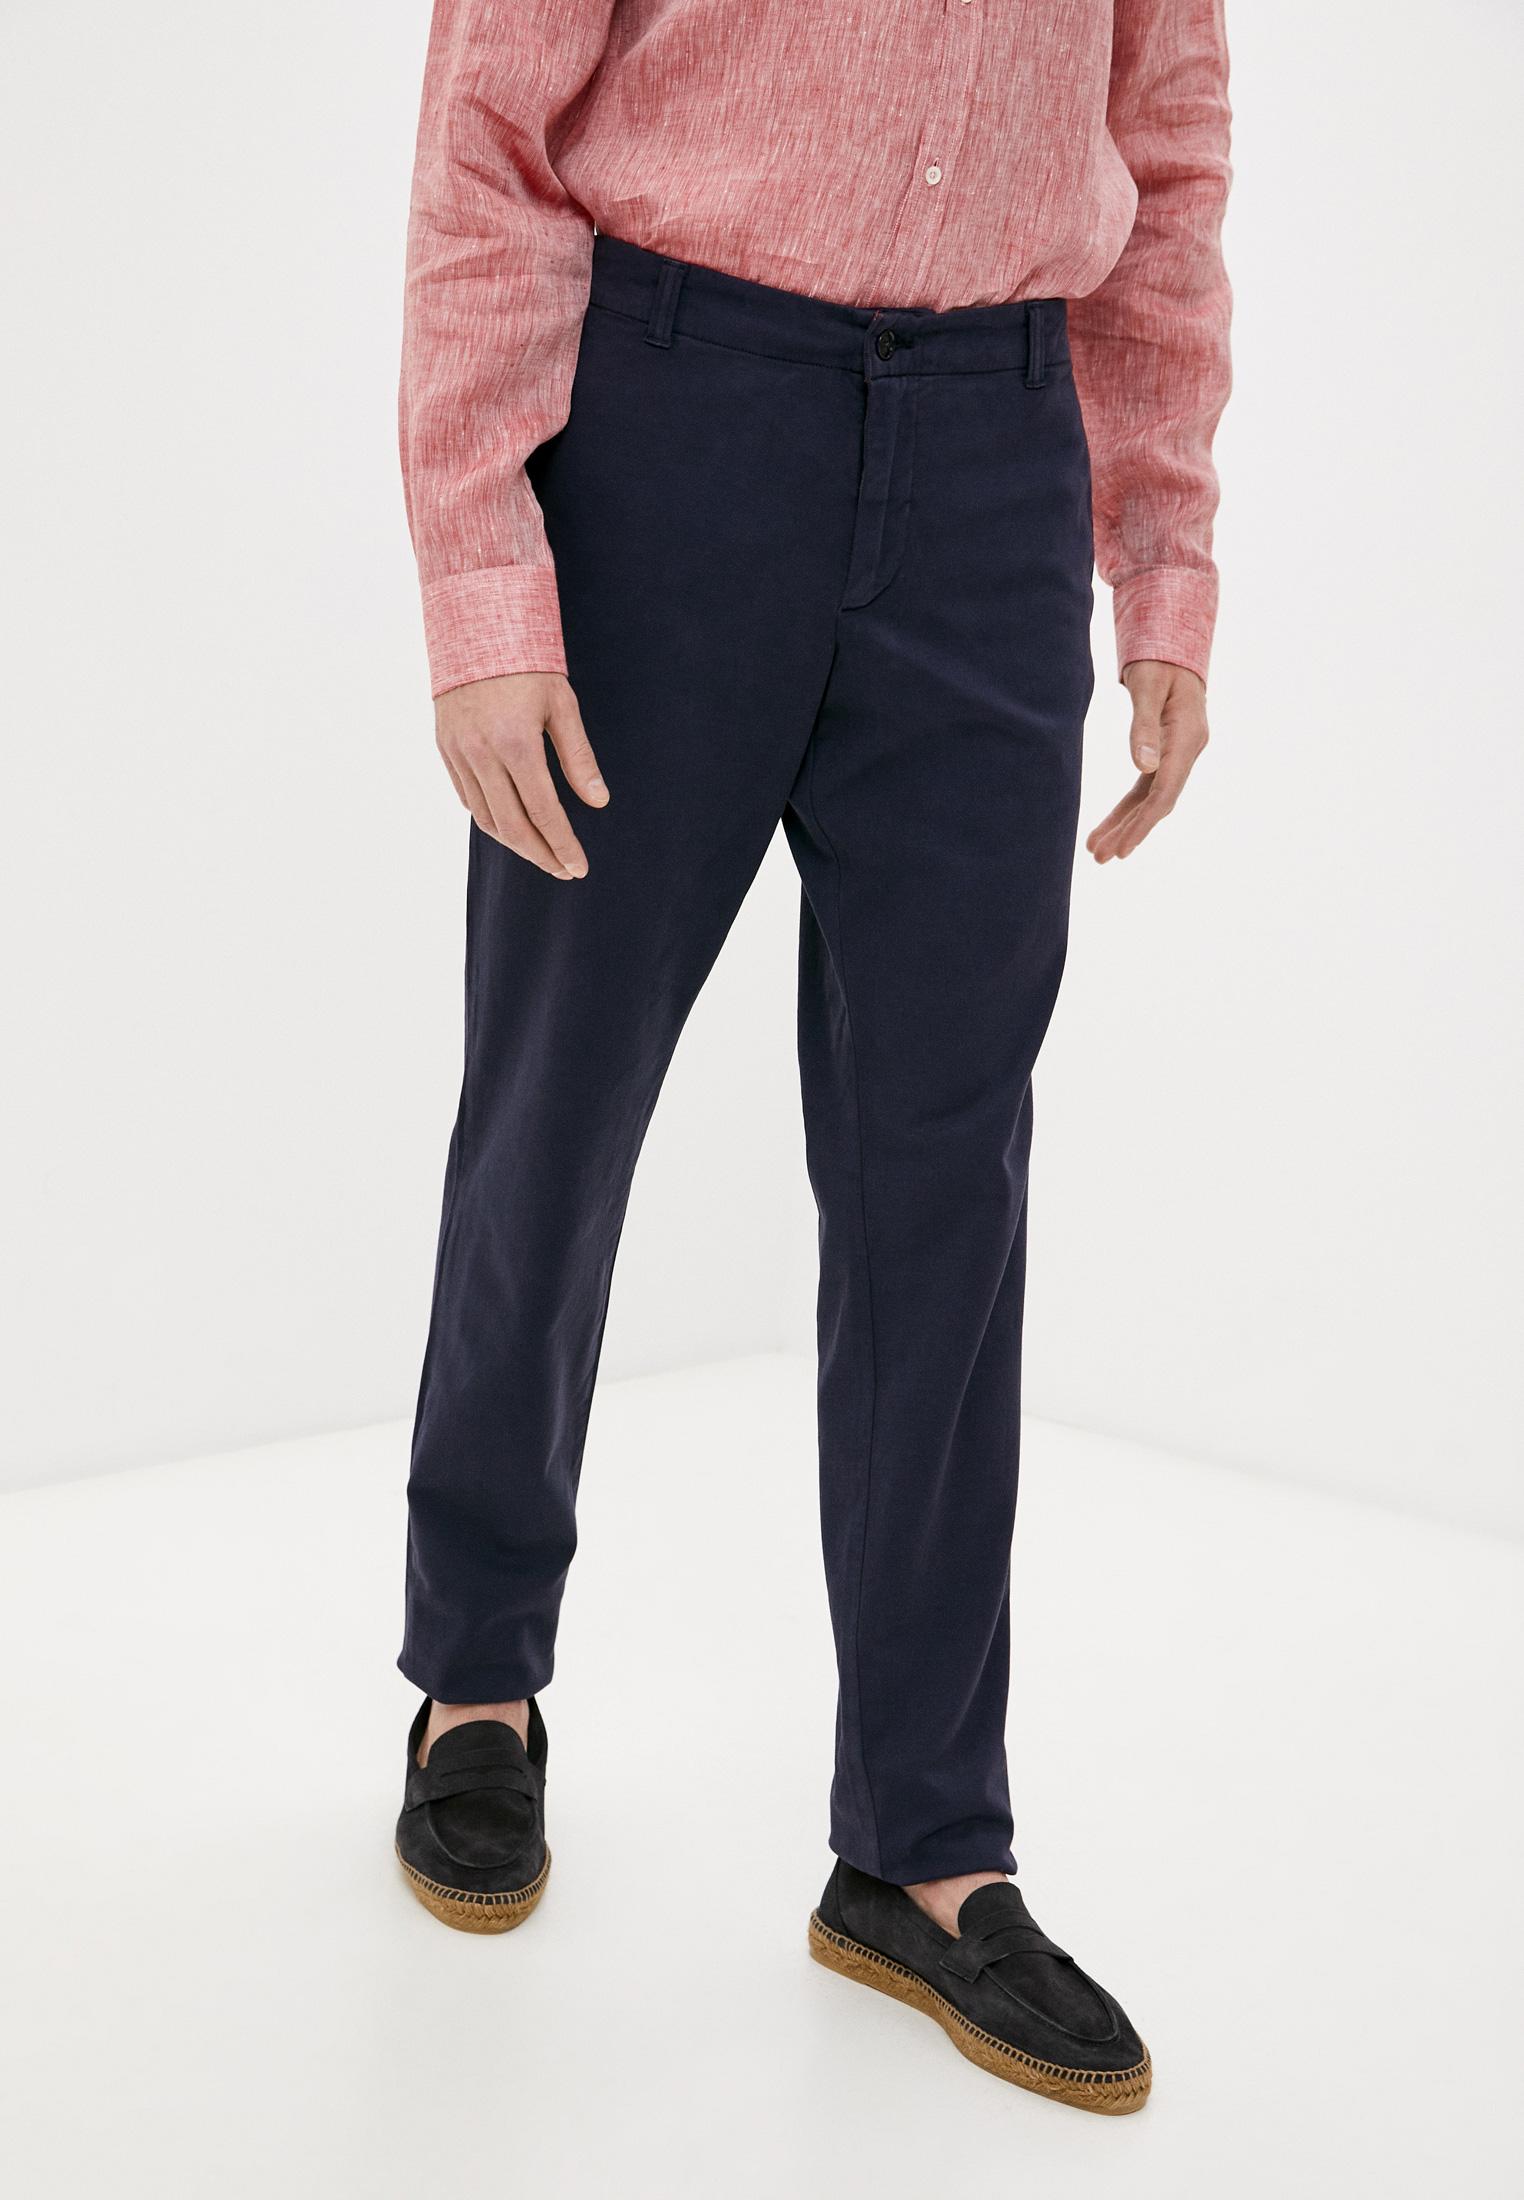 Мужские брюки Trussardi 52P00111-1T003143-H-001